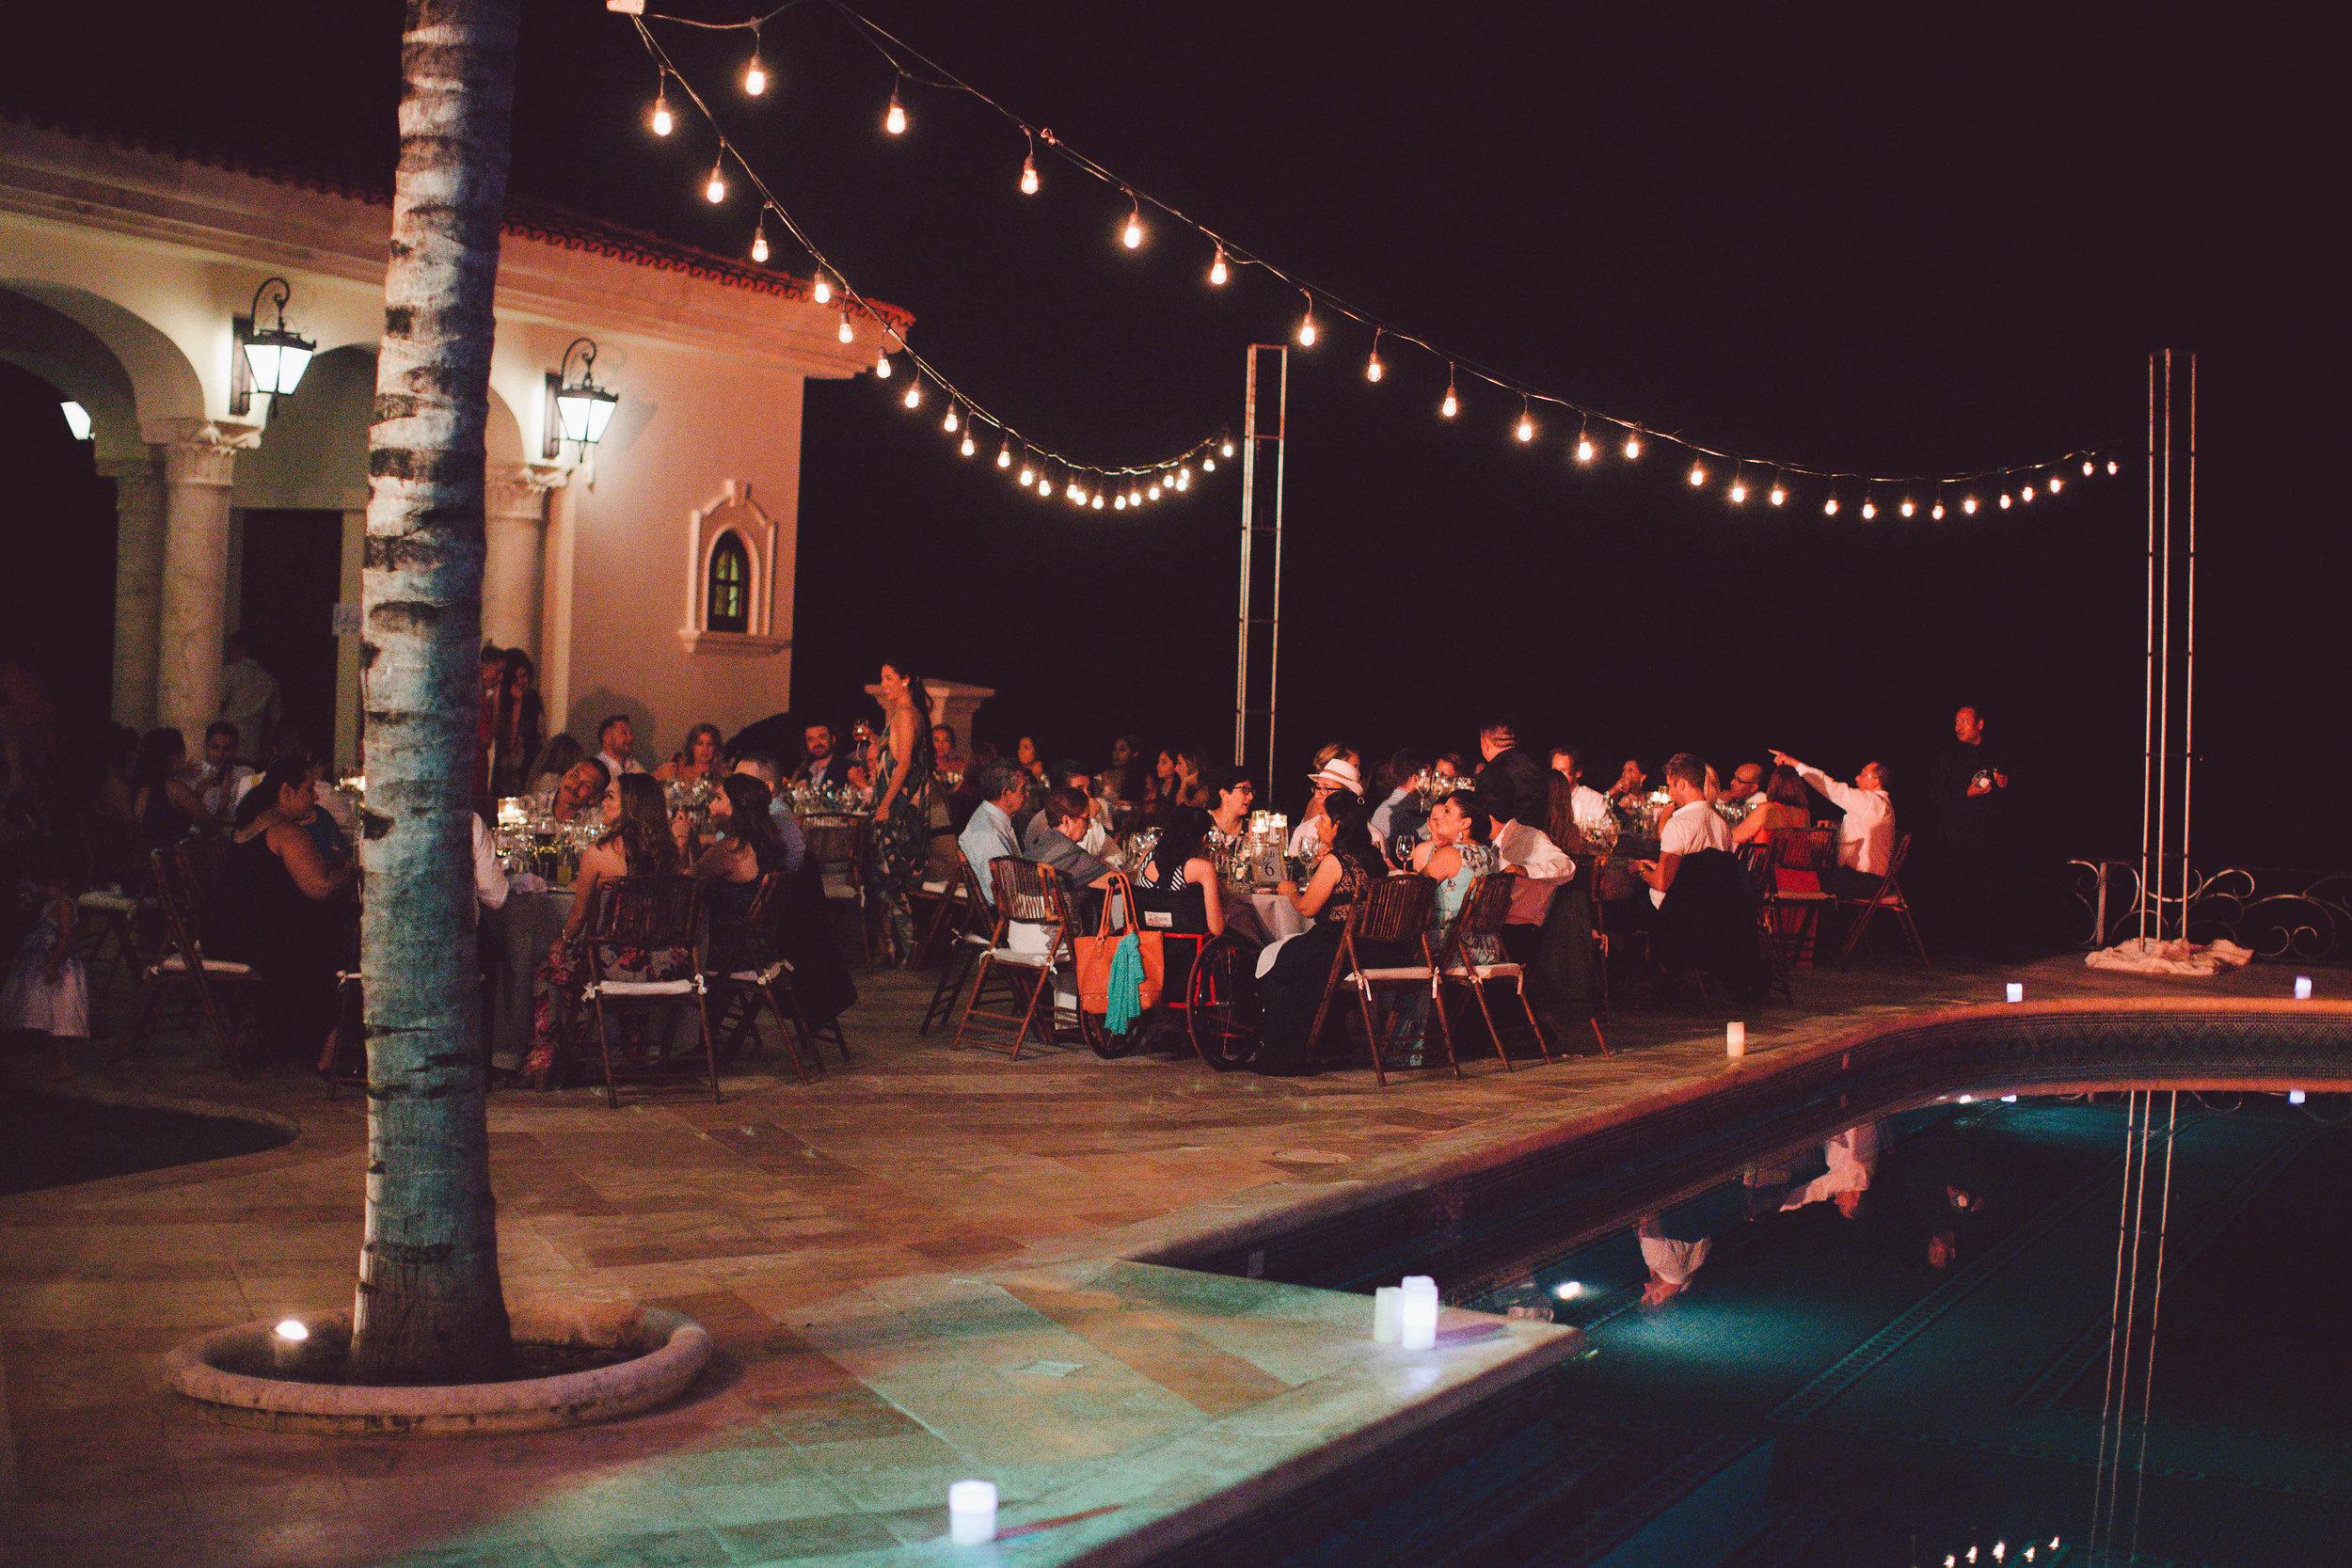 mexico_wedding_cancun_villa_la_joya_evangeline_lane_133.jpg